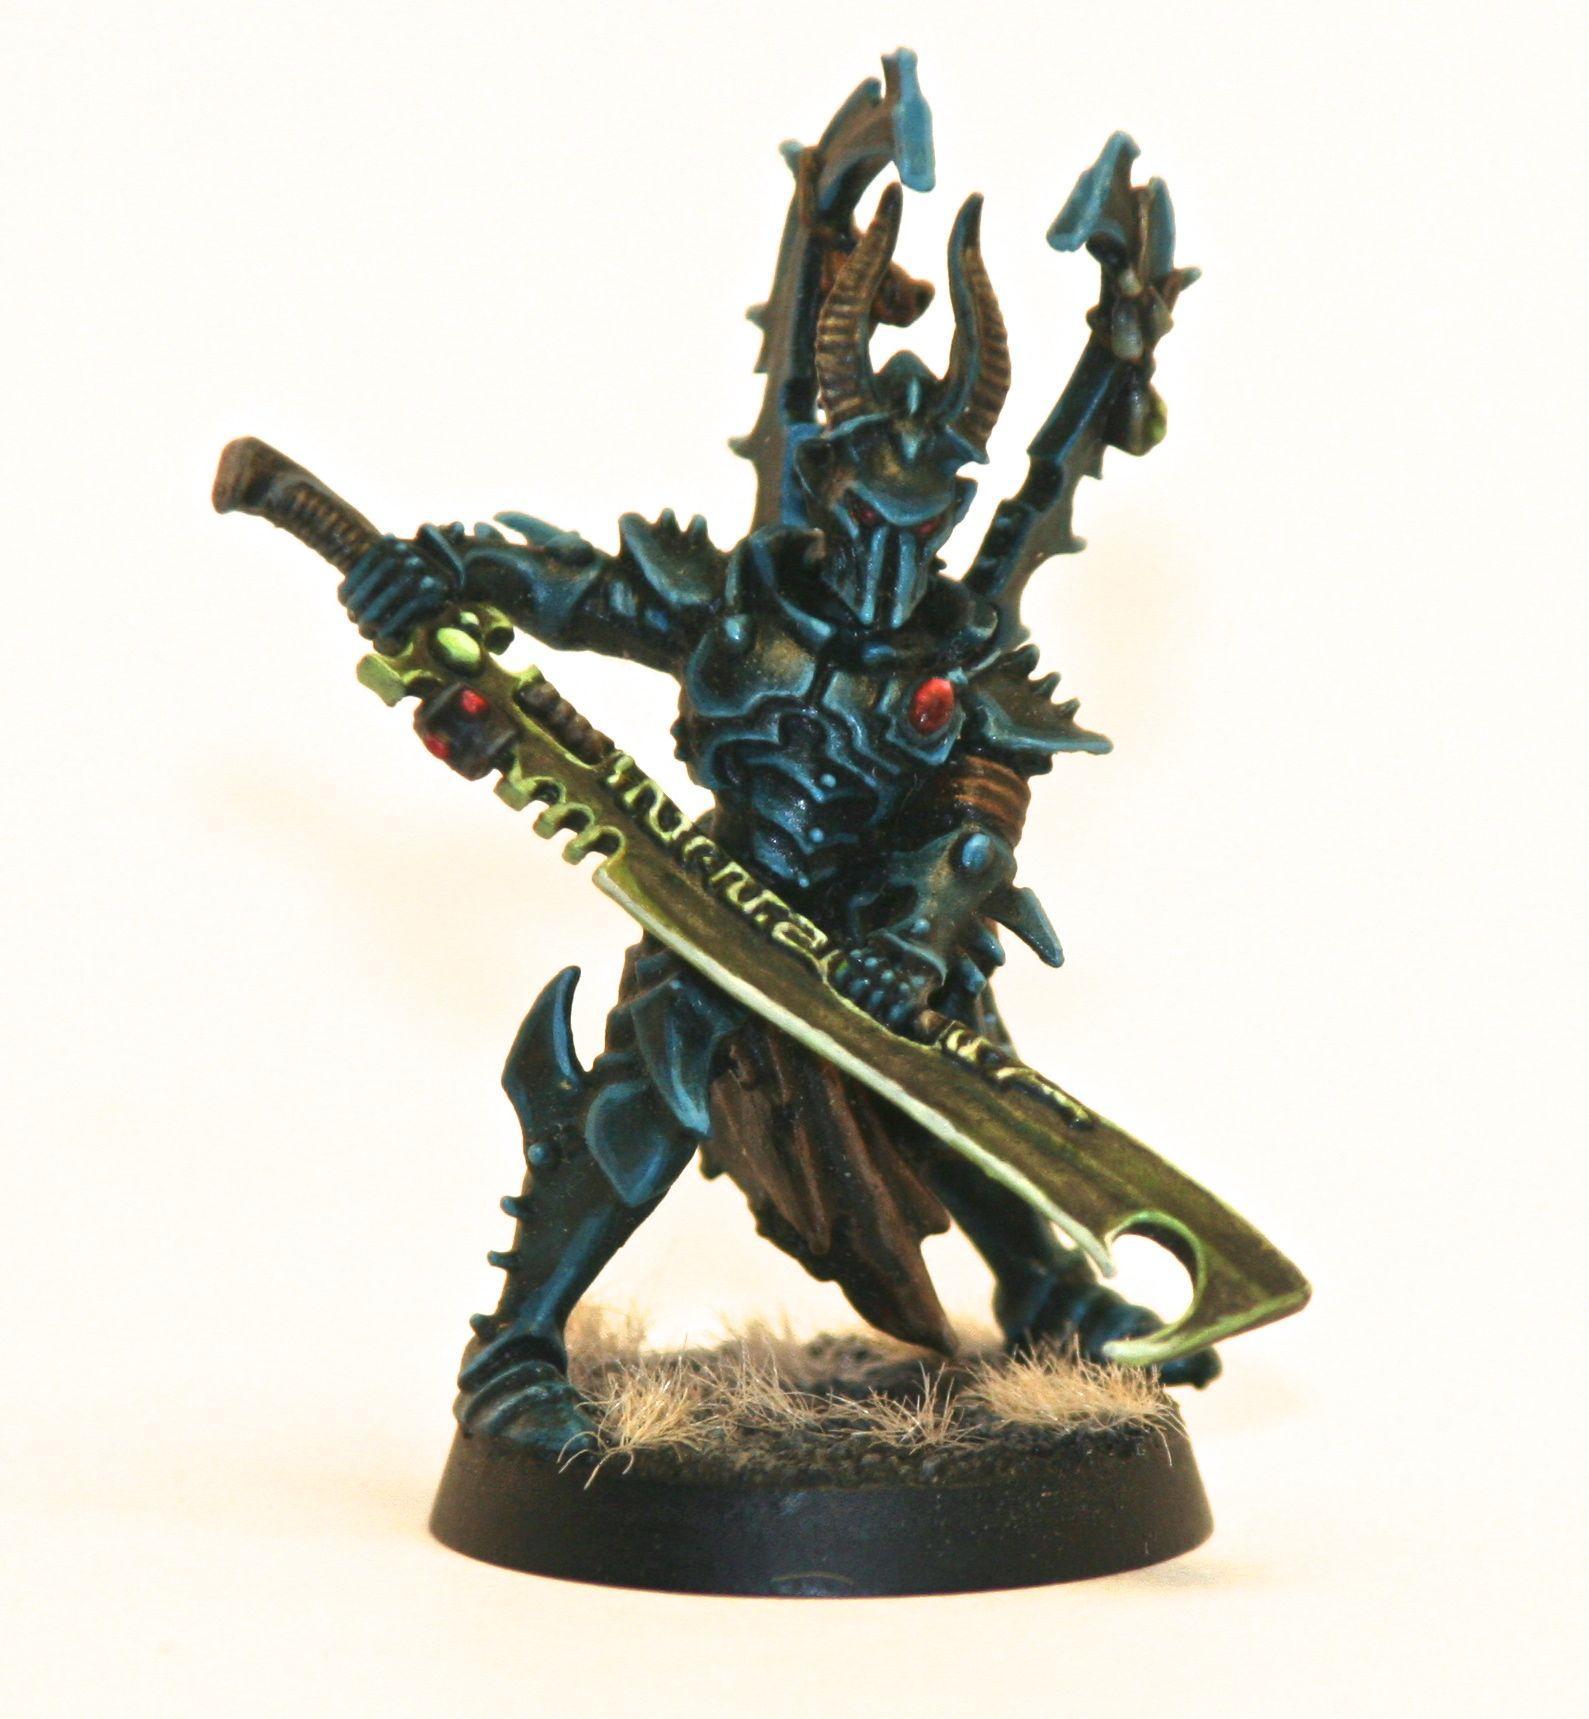 Dark Eldar, Incubi, Warhammer 40,000